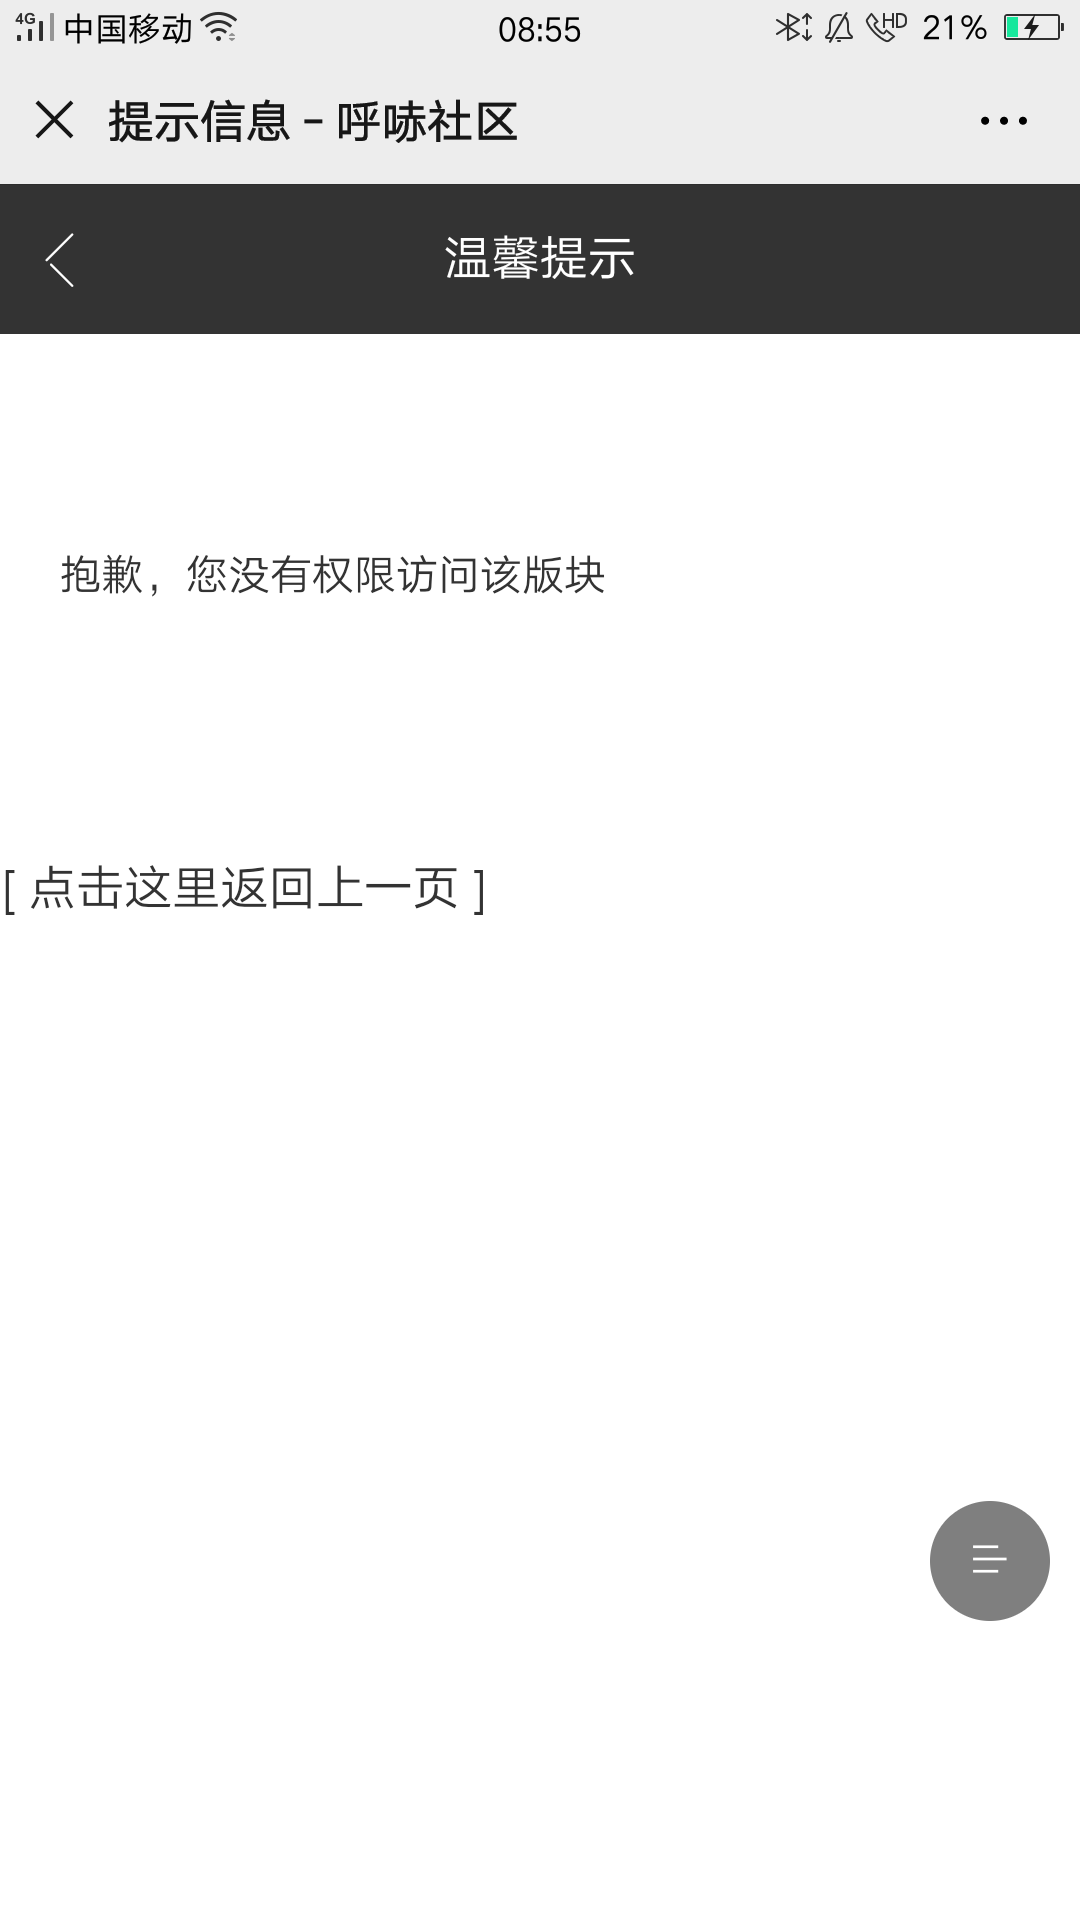 Screenshot_2020-03-27-08-55-25-78.png